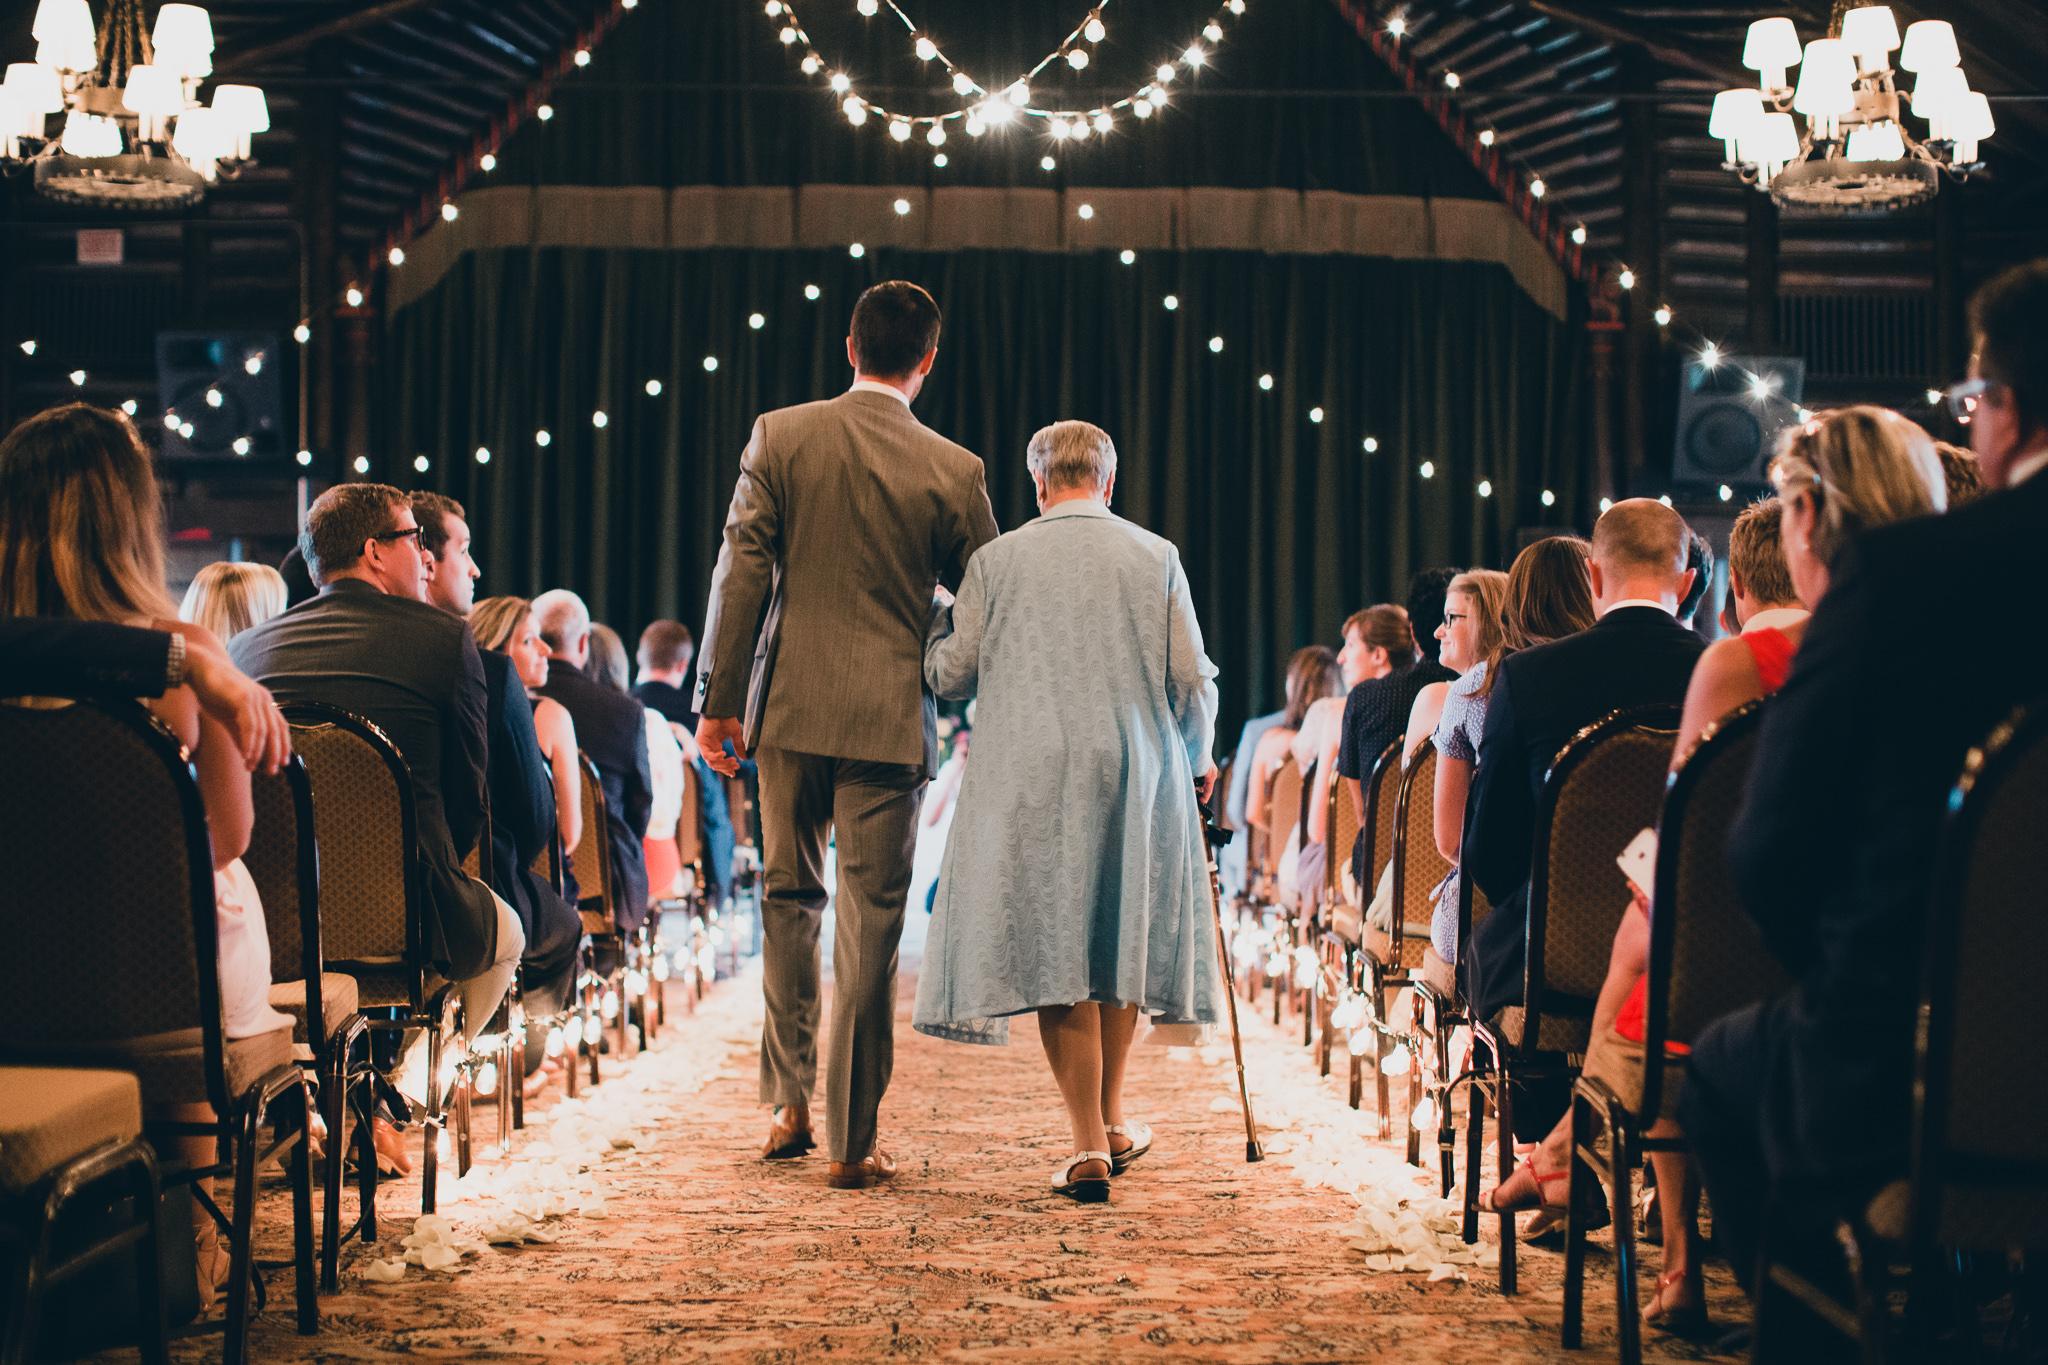 Chateau Montebello Indoor wedding ceremony location